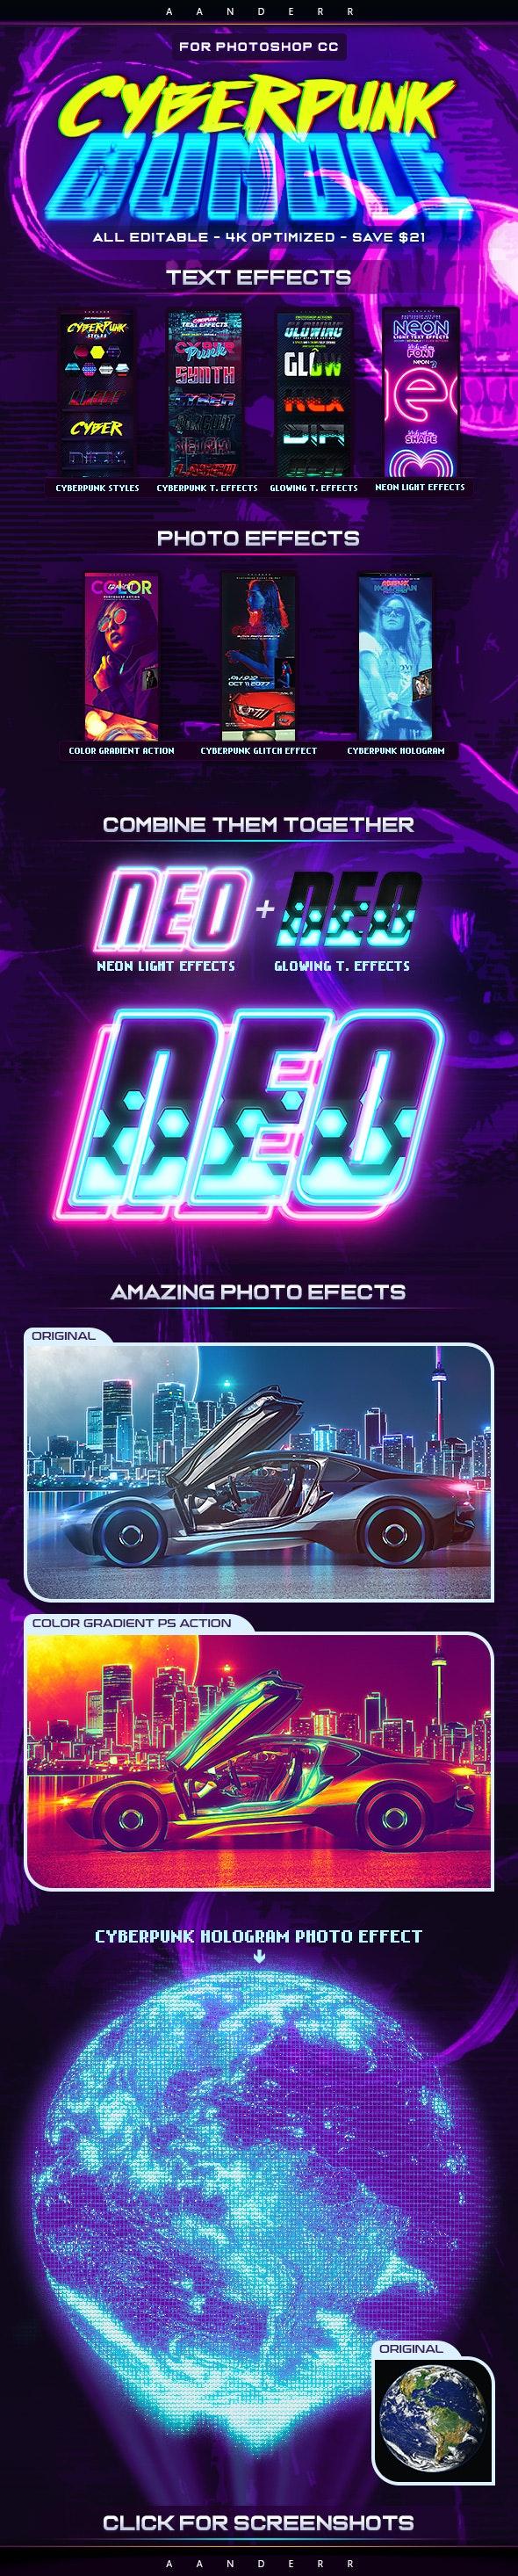 Cyberpunk Photoshop Effects Bundle - Actions Photoshop